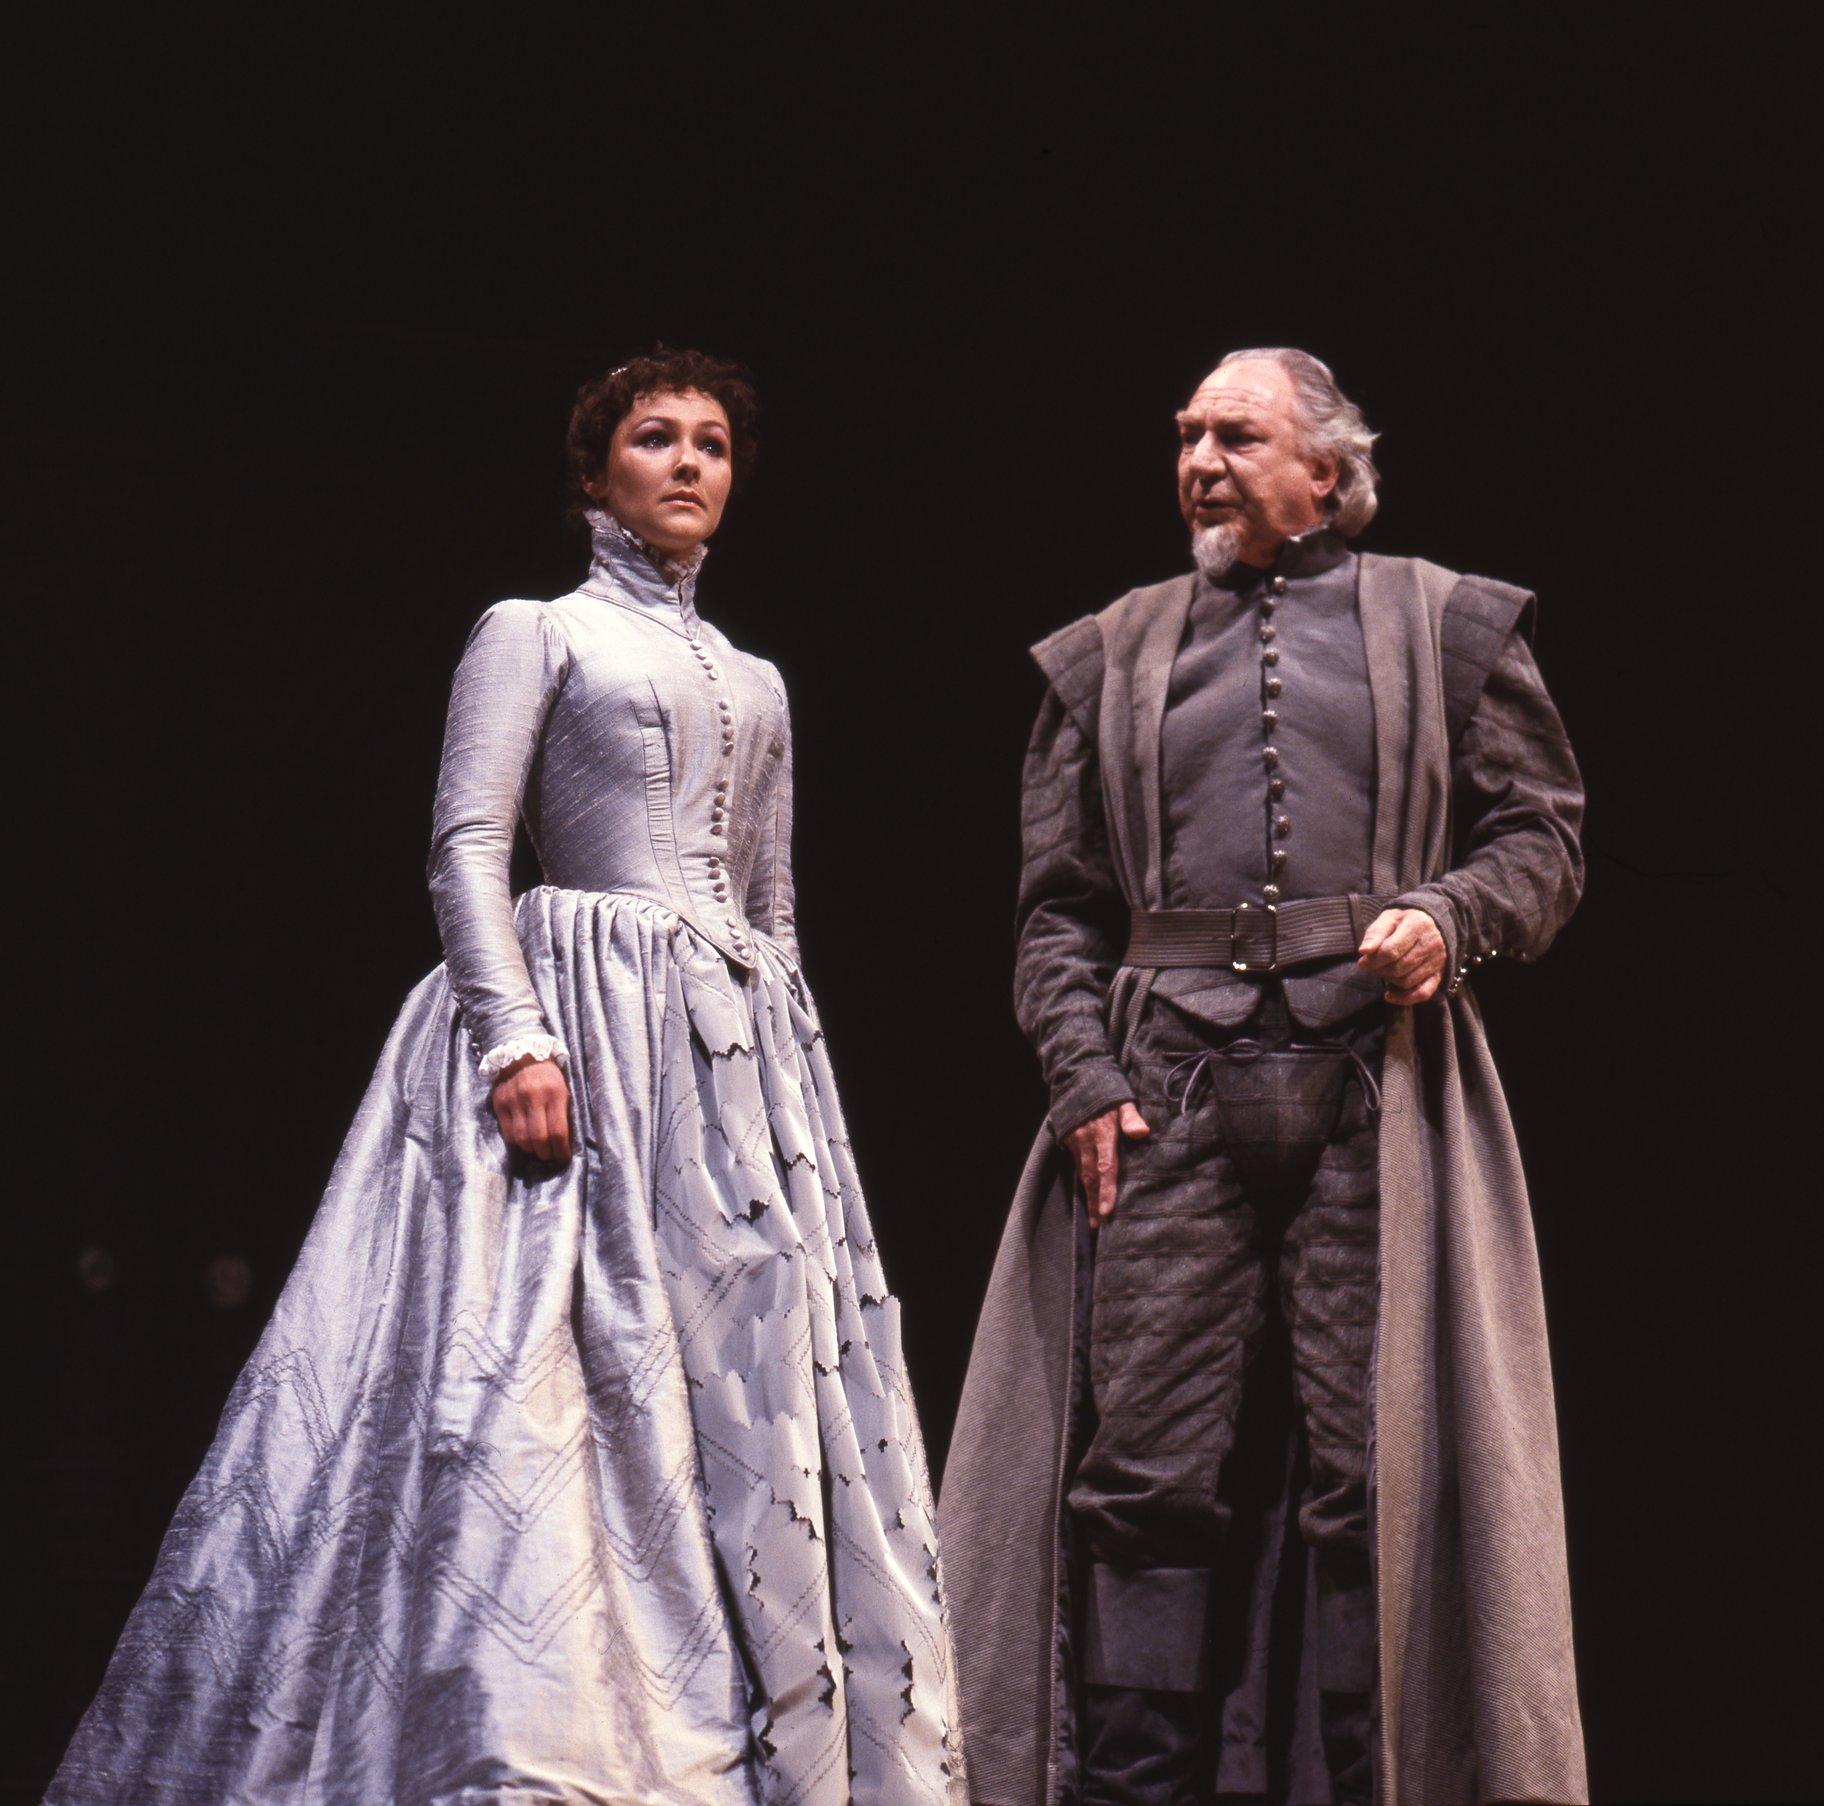 Ophelia and Polonius.